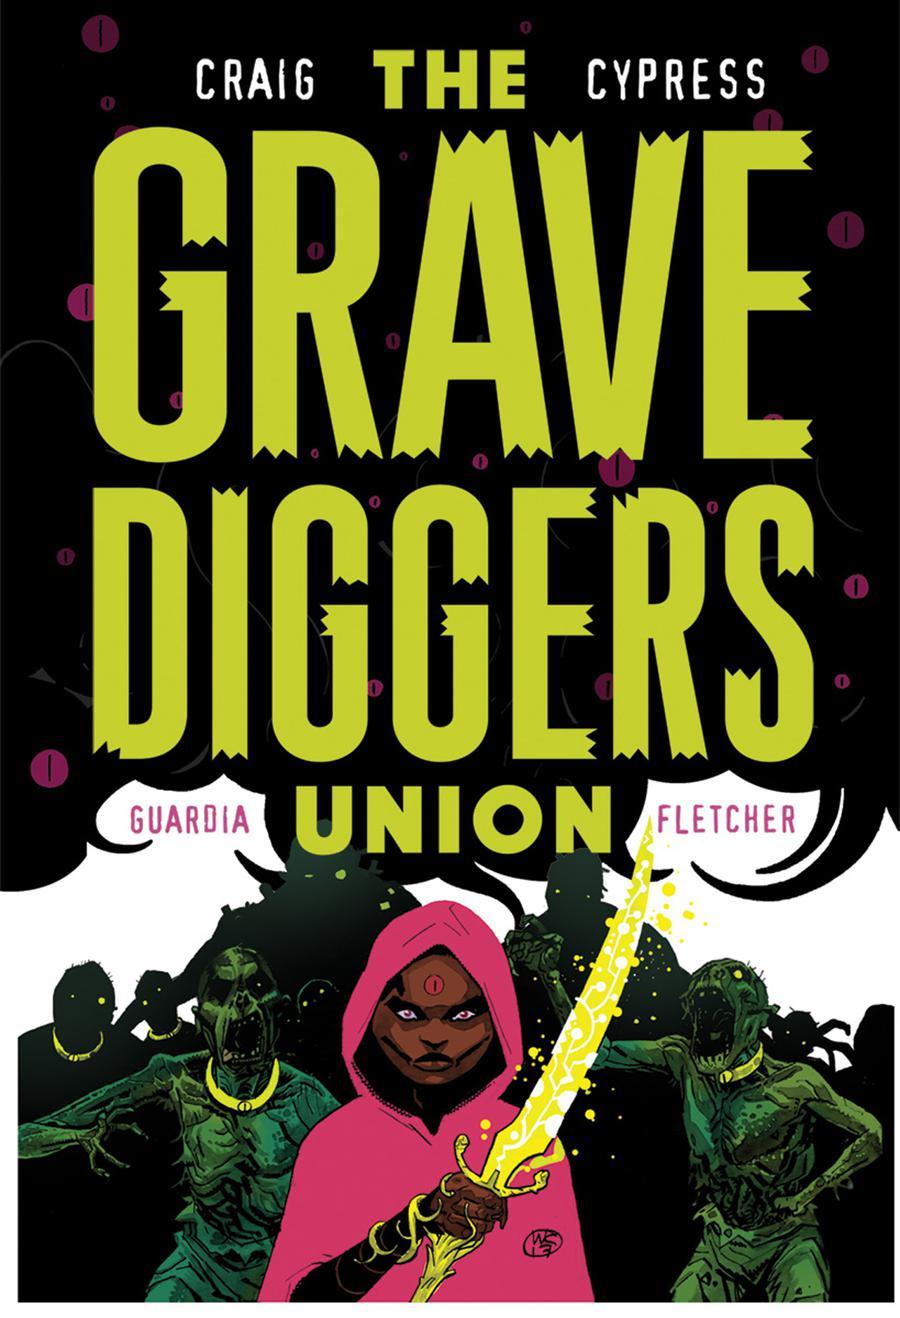 Gravediggers Union #7 Cover A Regular Wes Craig Cover